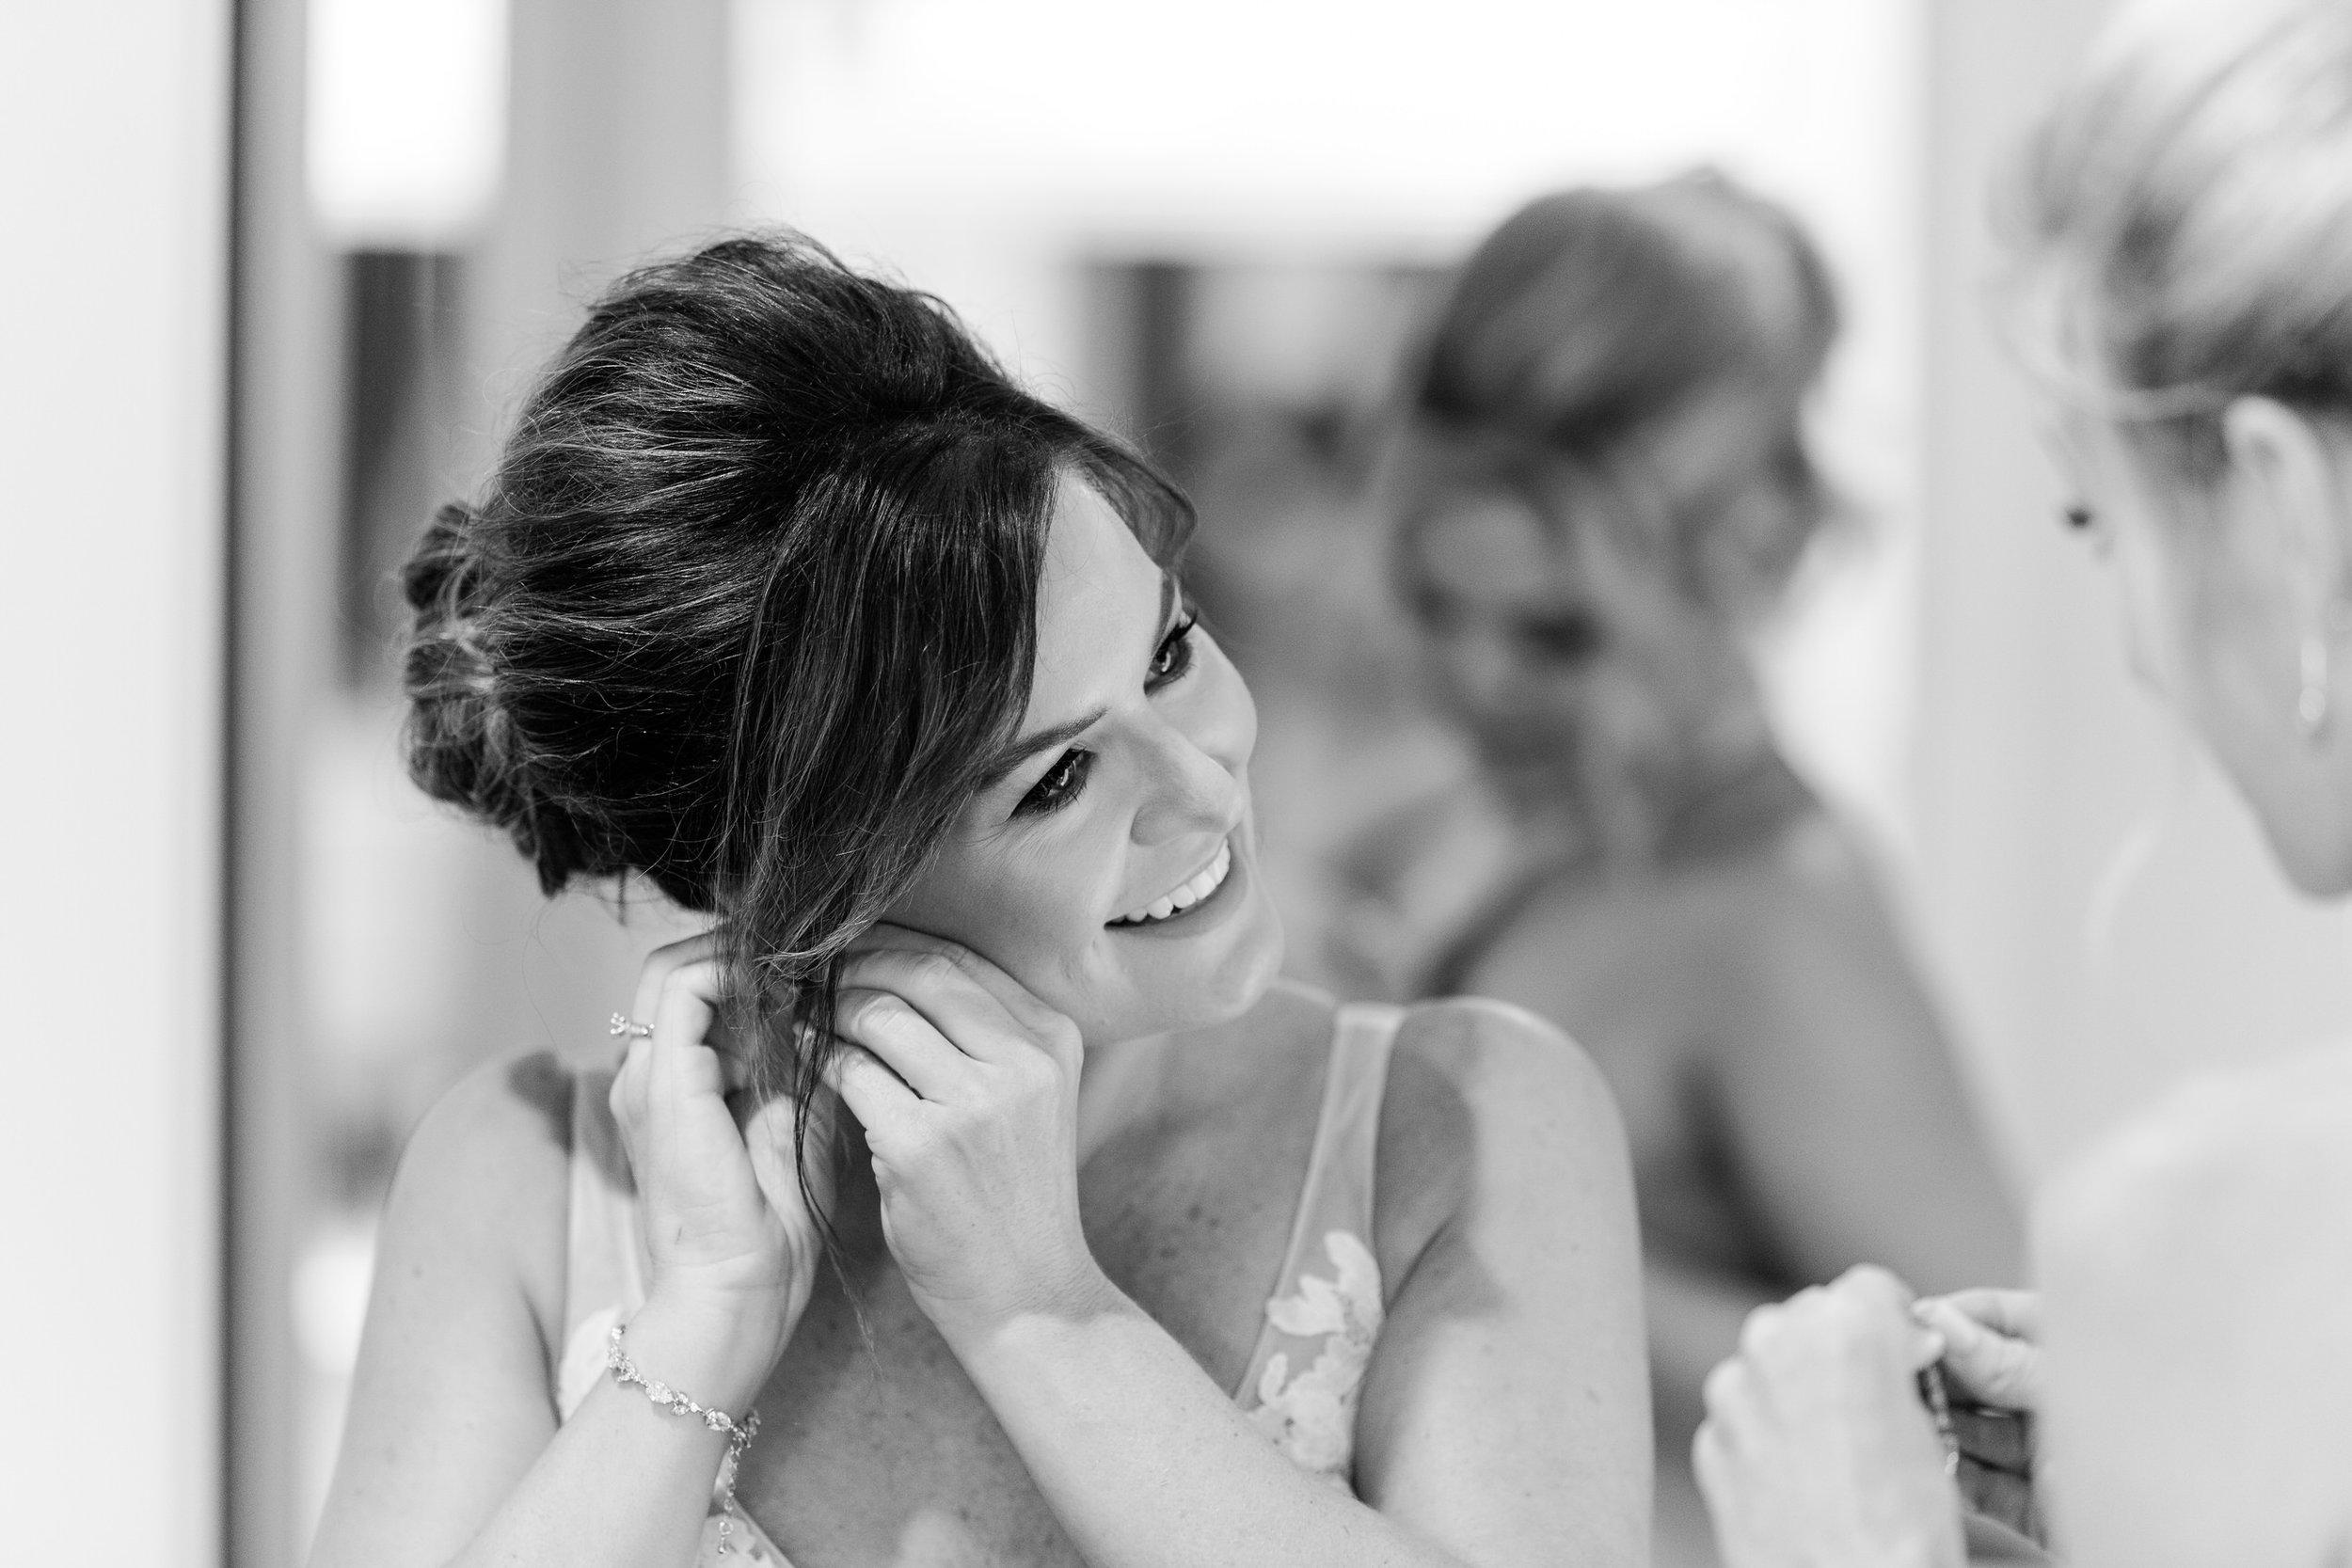 Justin_And_Jim_Photography_Chateau_Dore_Bendigo_Wedding21.JPG